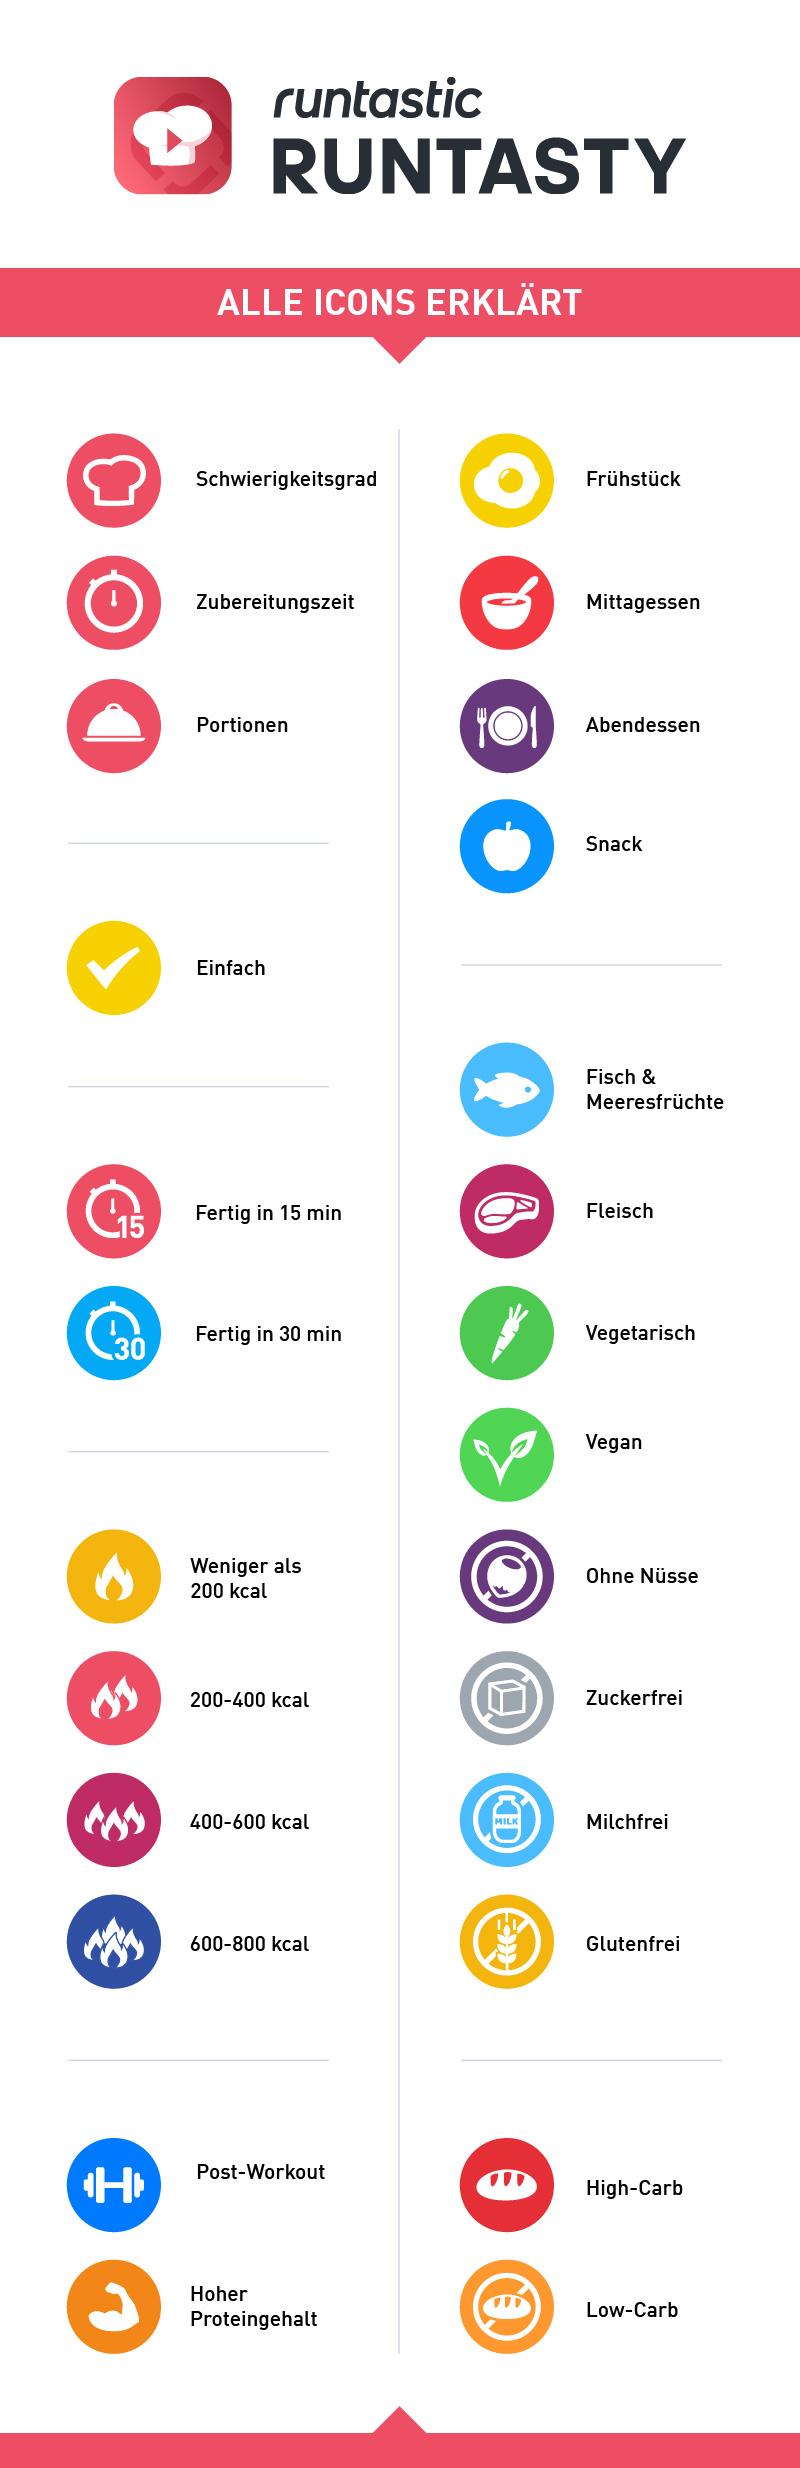 Runtasty App von Runtastic